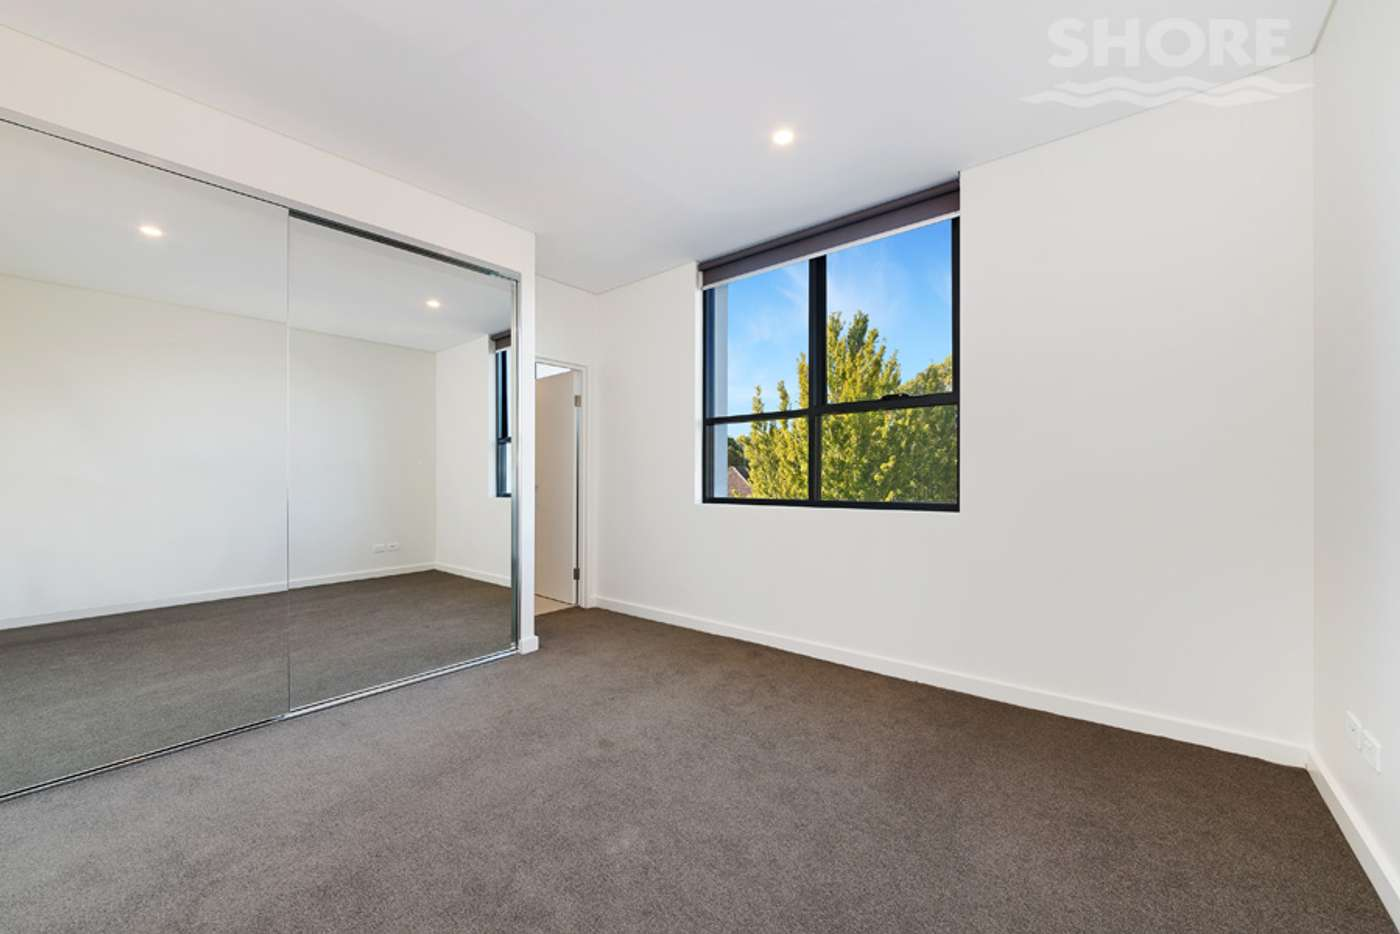 Seventh view of Homely apartment listing, 101/4 Culworth Avenue, Killara NSW 2071